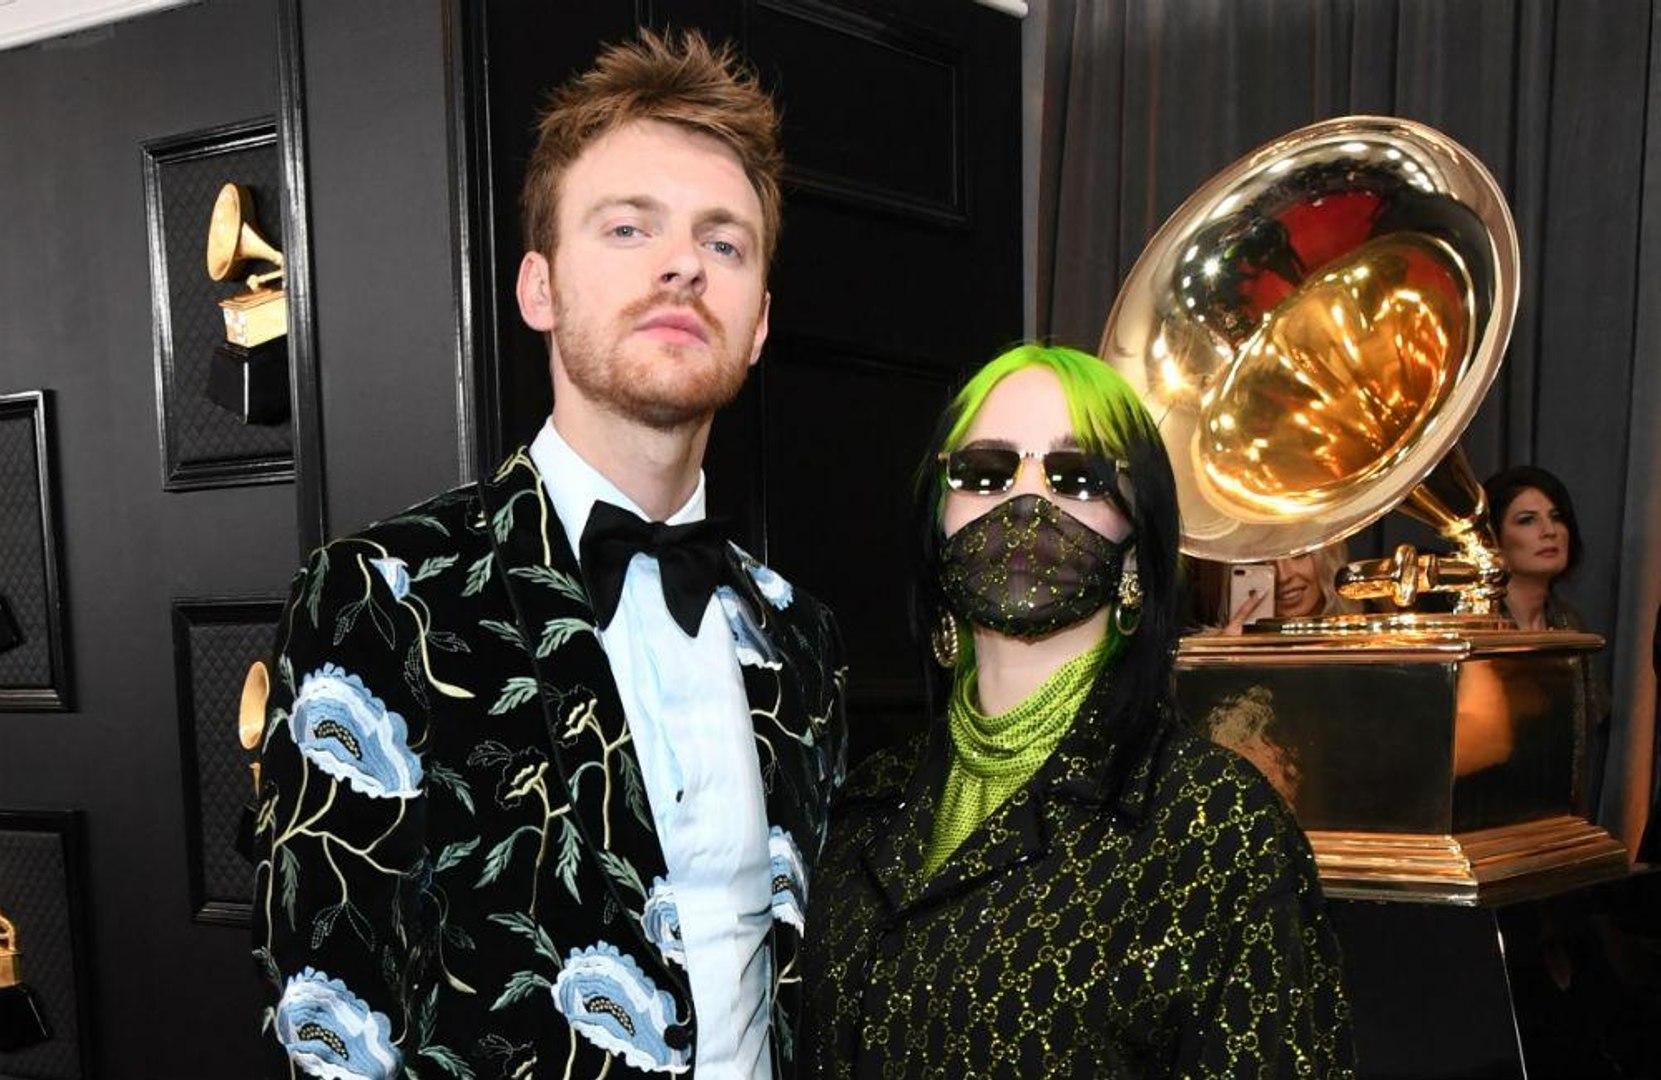 Billie Eilish 'embarrassed' by Grammy Awards sweep